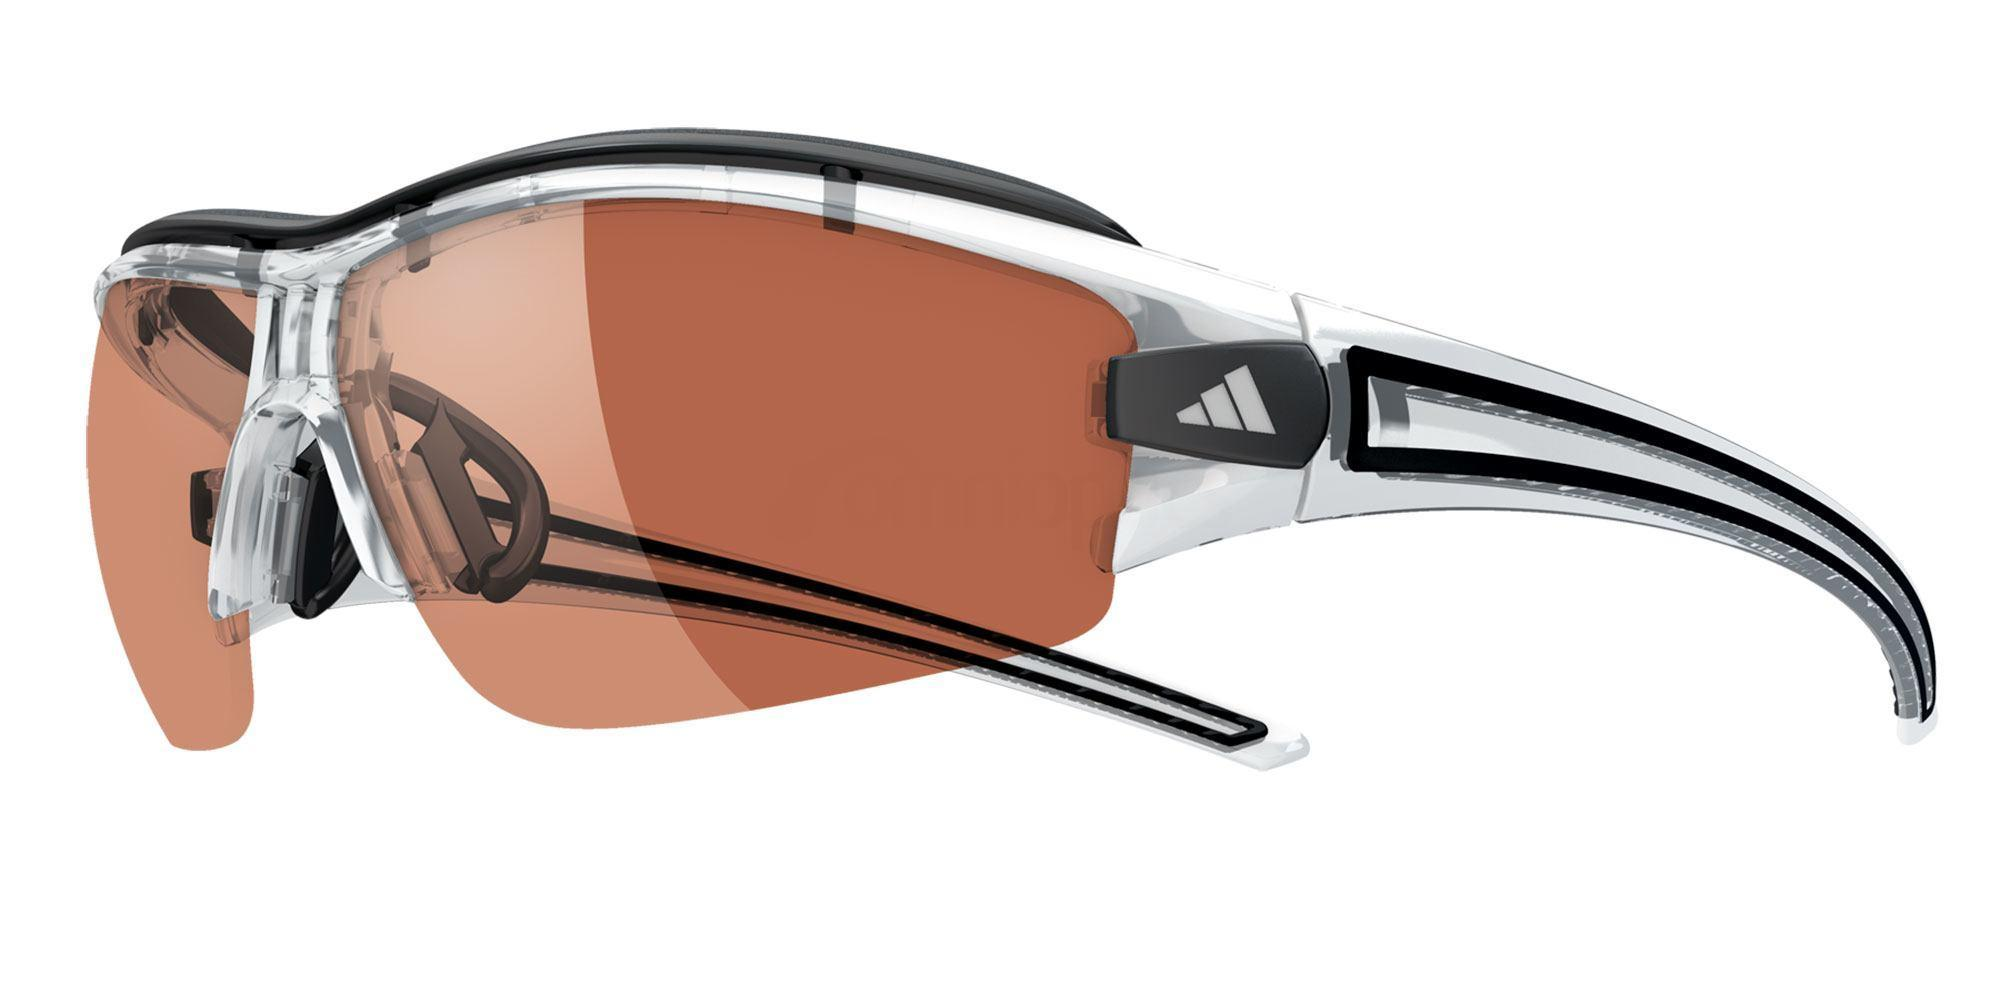 a180/00 6078 a180 Evil Eye Halfrim Pro XS (2/2) , Adidas